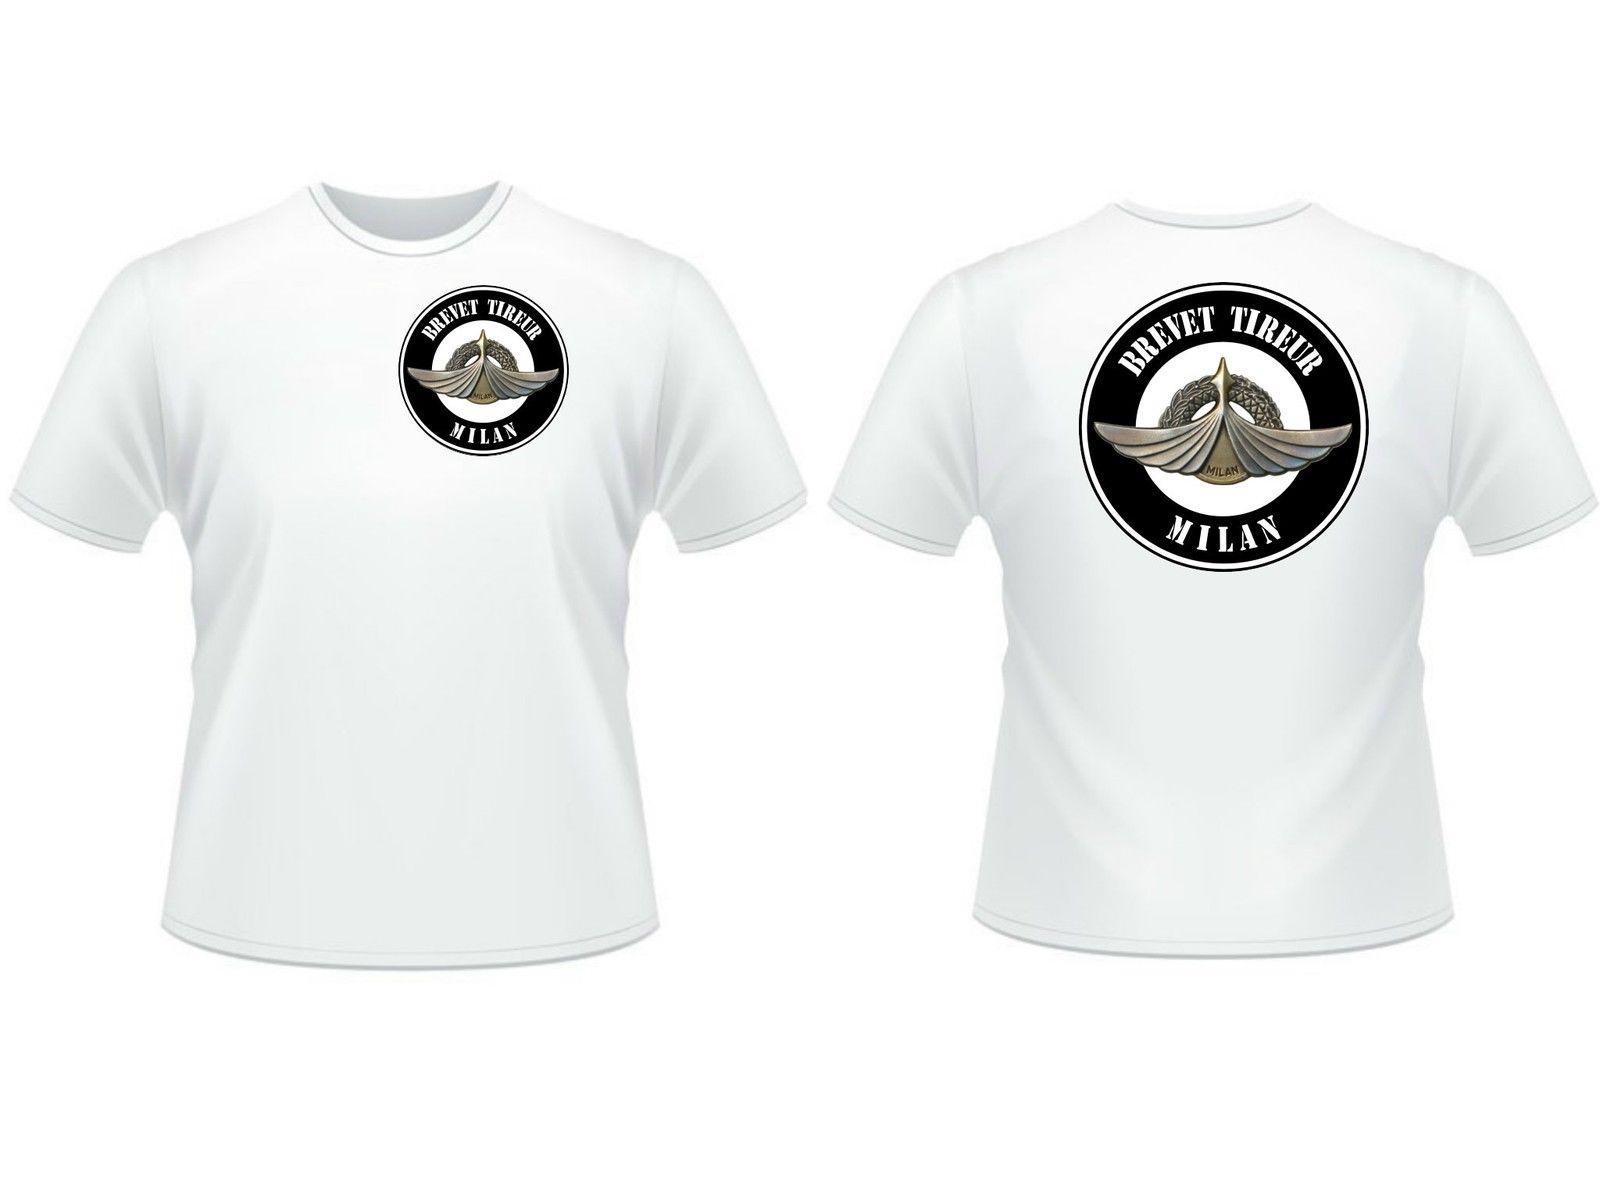 2018 Men Cool Tee Shirt T-SHIRT  BREVET TIREUR MILAN  recto / verso - Section ANTI CHAR infanterie Summer T-shirt